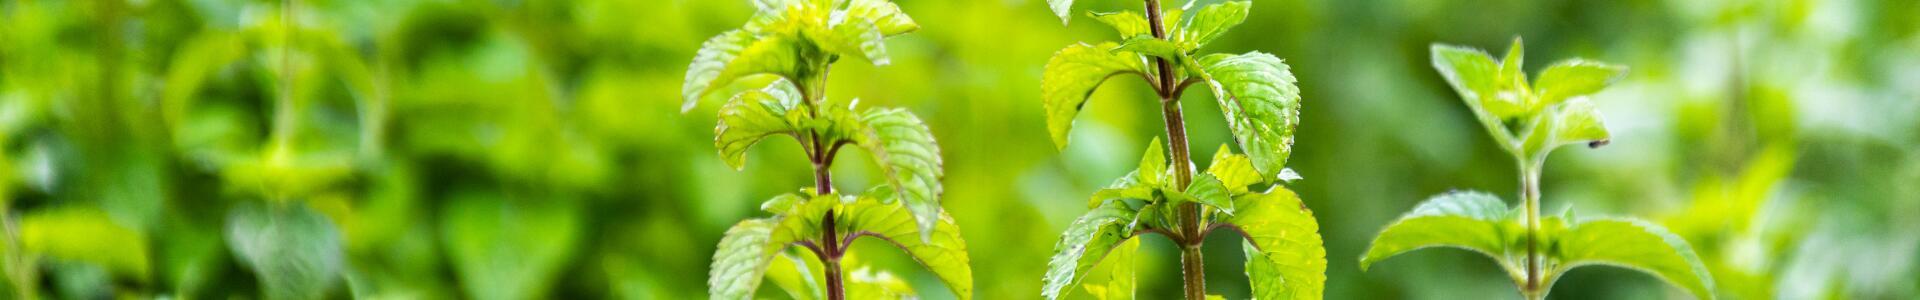 kl_mint_active-ingredient_field_plant_2019 -10-